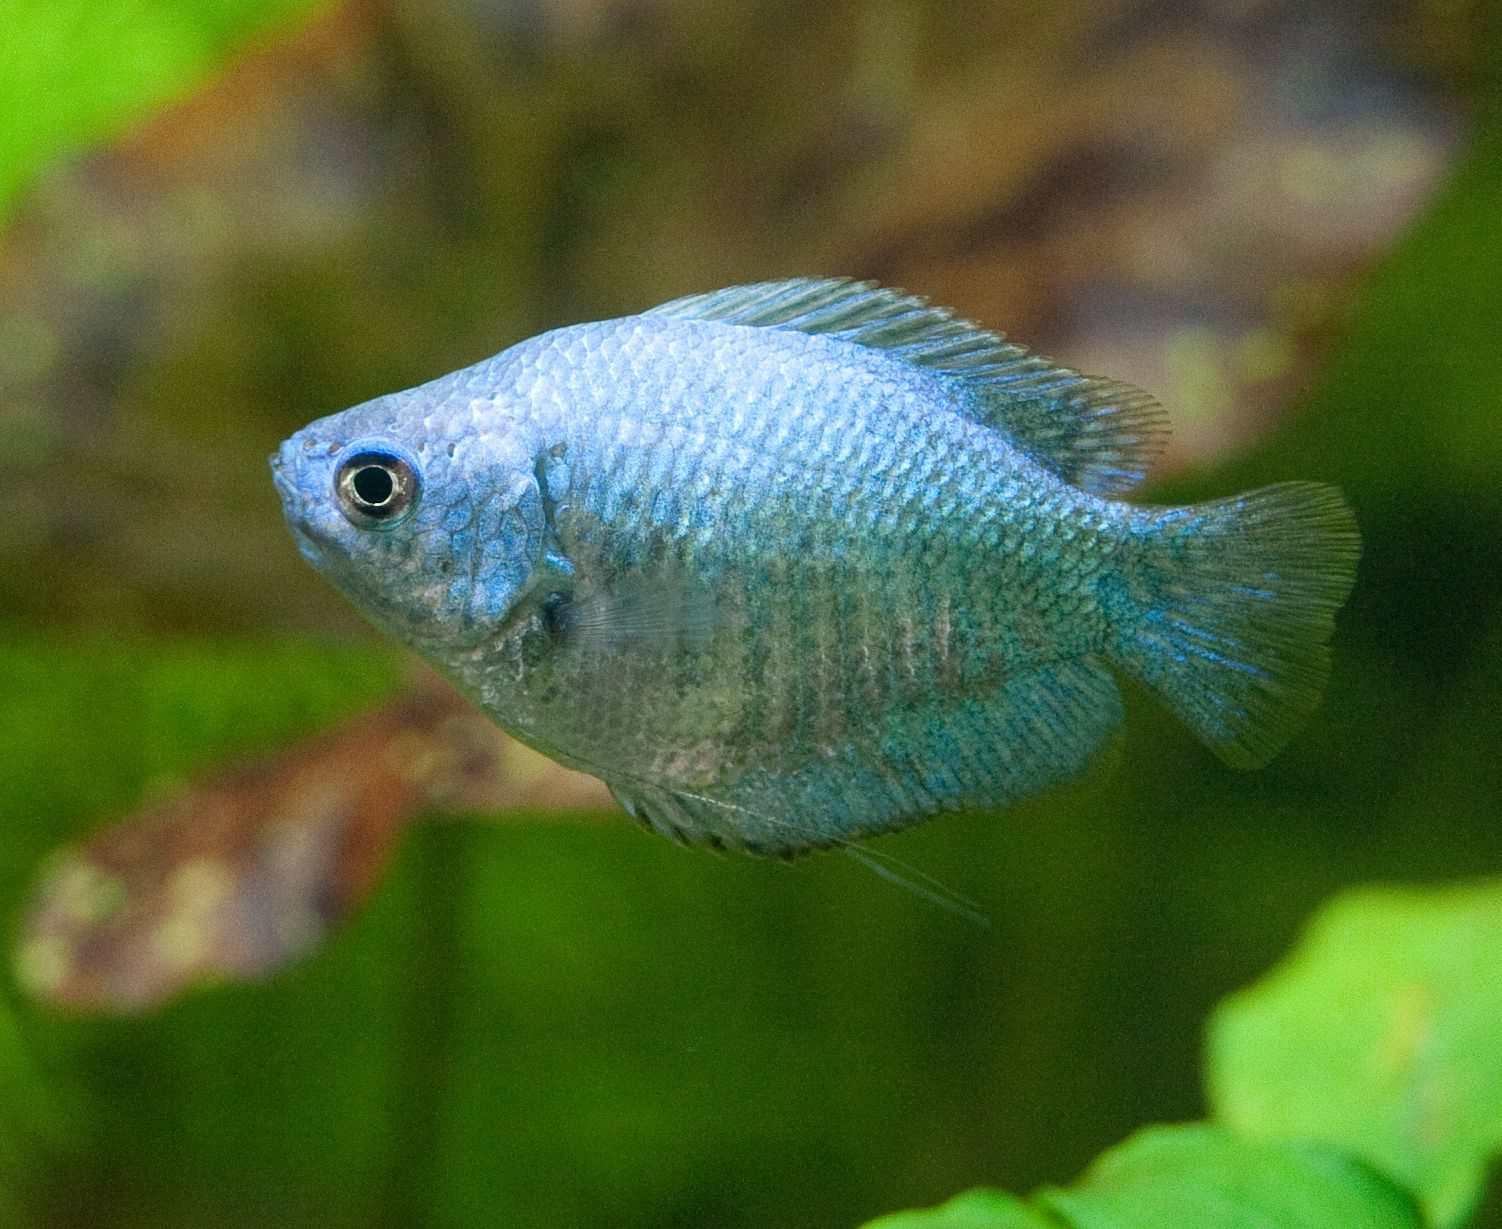 Different Species of Gourami Fish